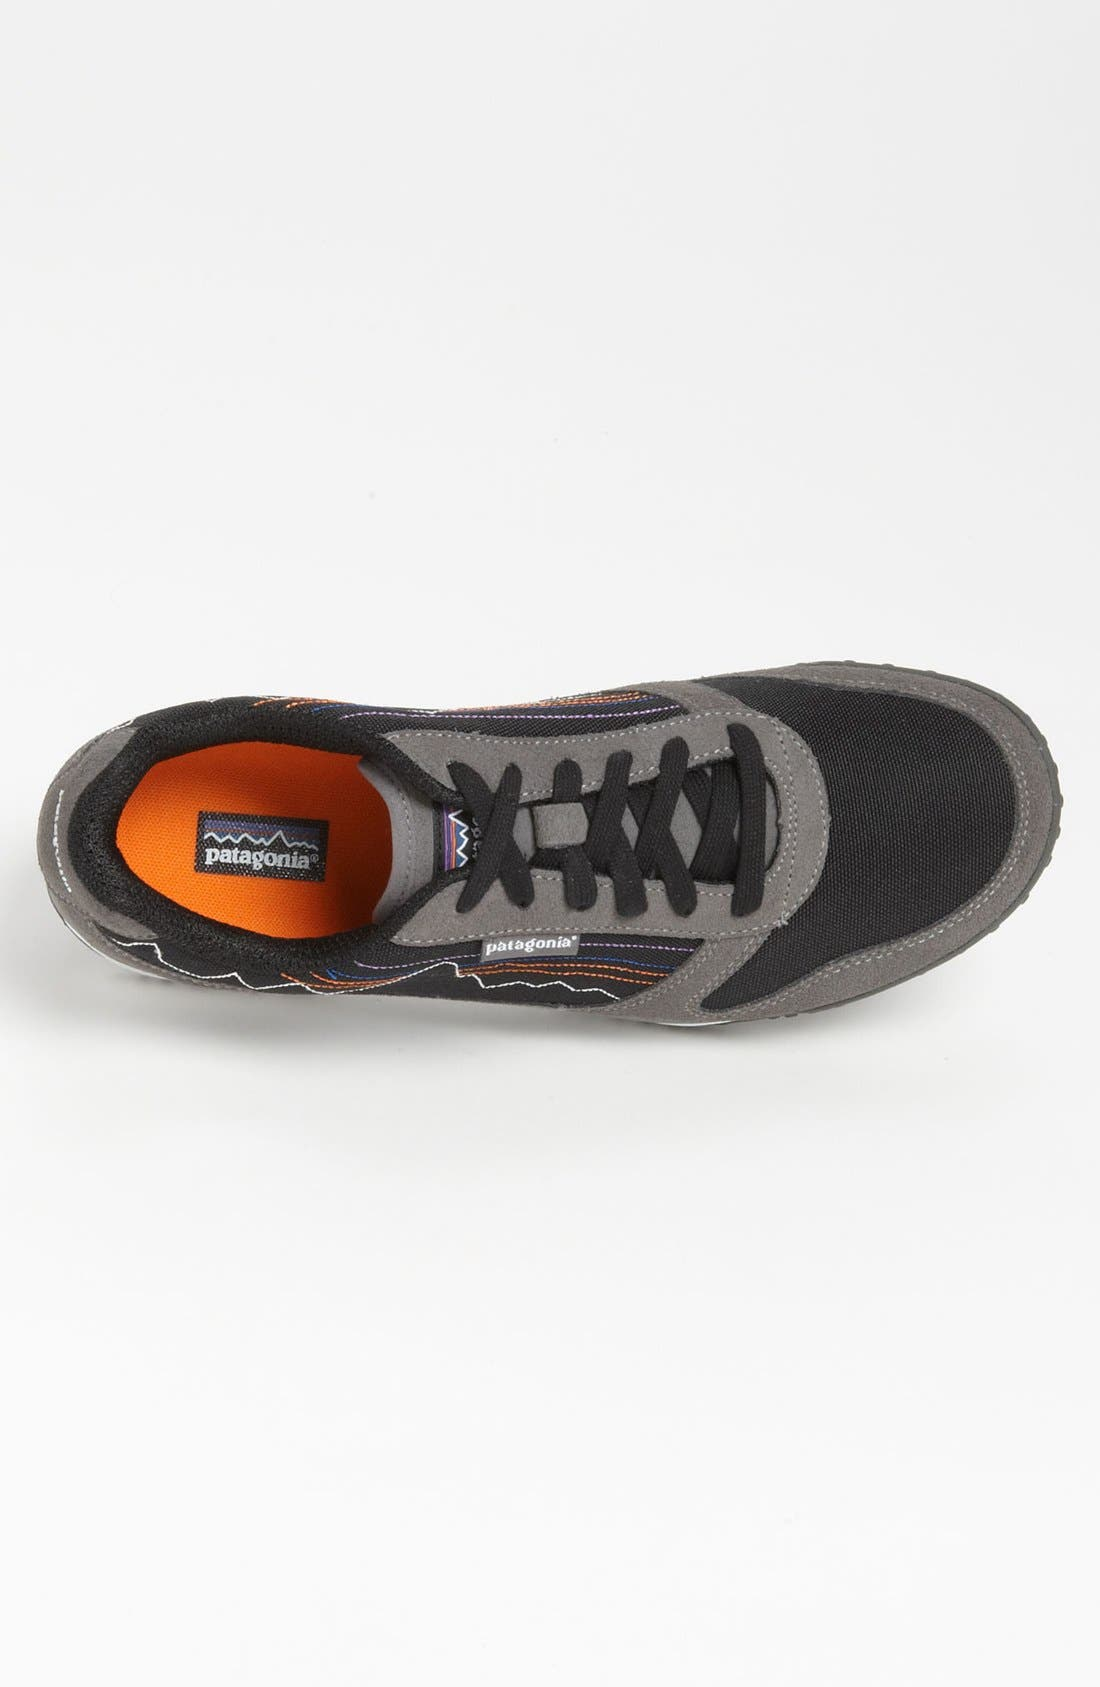 Alternate Image 3  - Patagonia 'Fitz' Sneaker (Men)